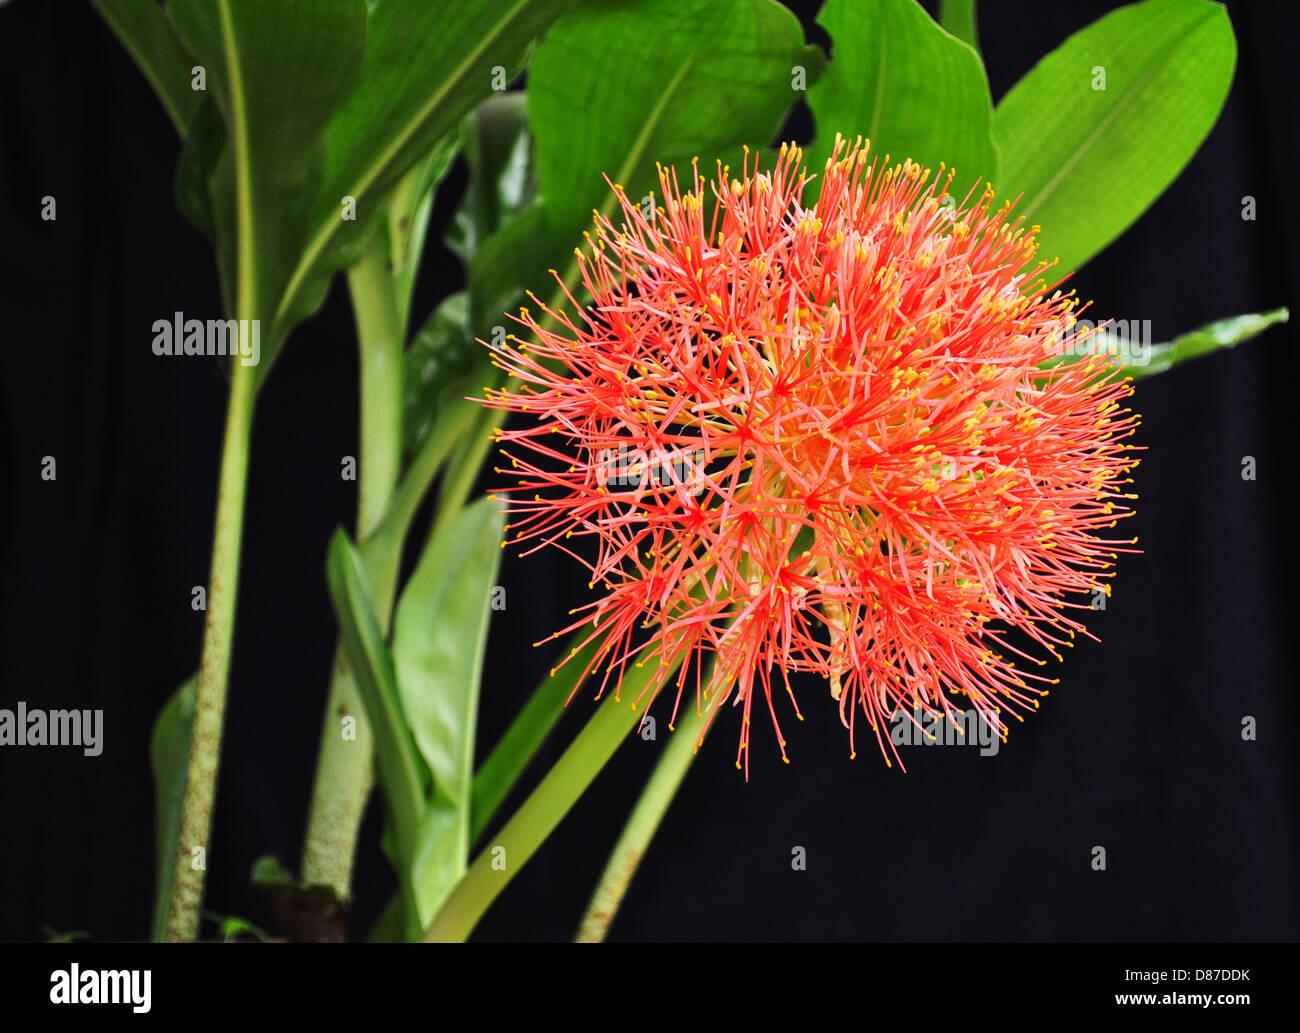 Haemanthus multiflorus plants and flower - Stock Image